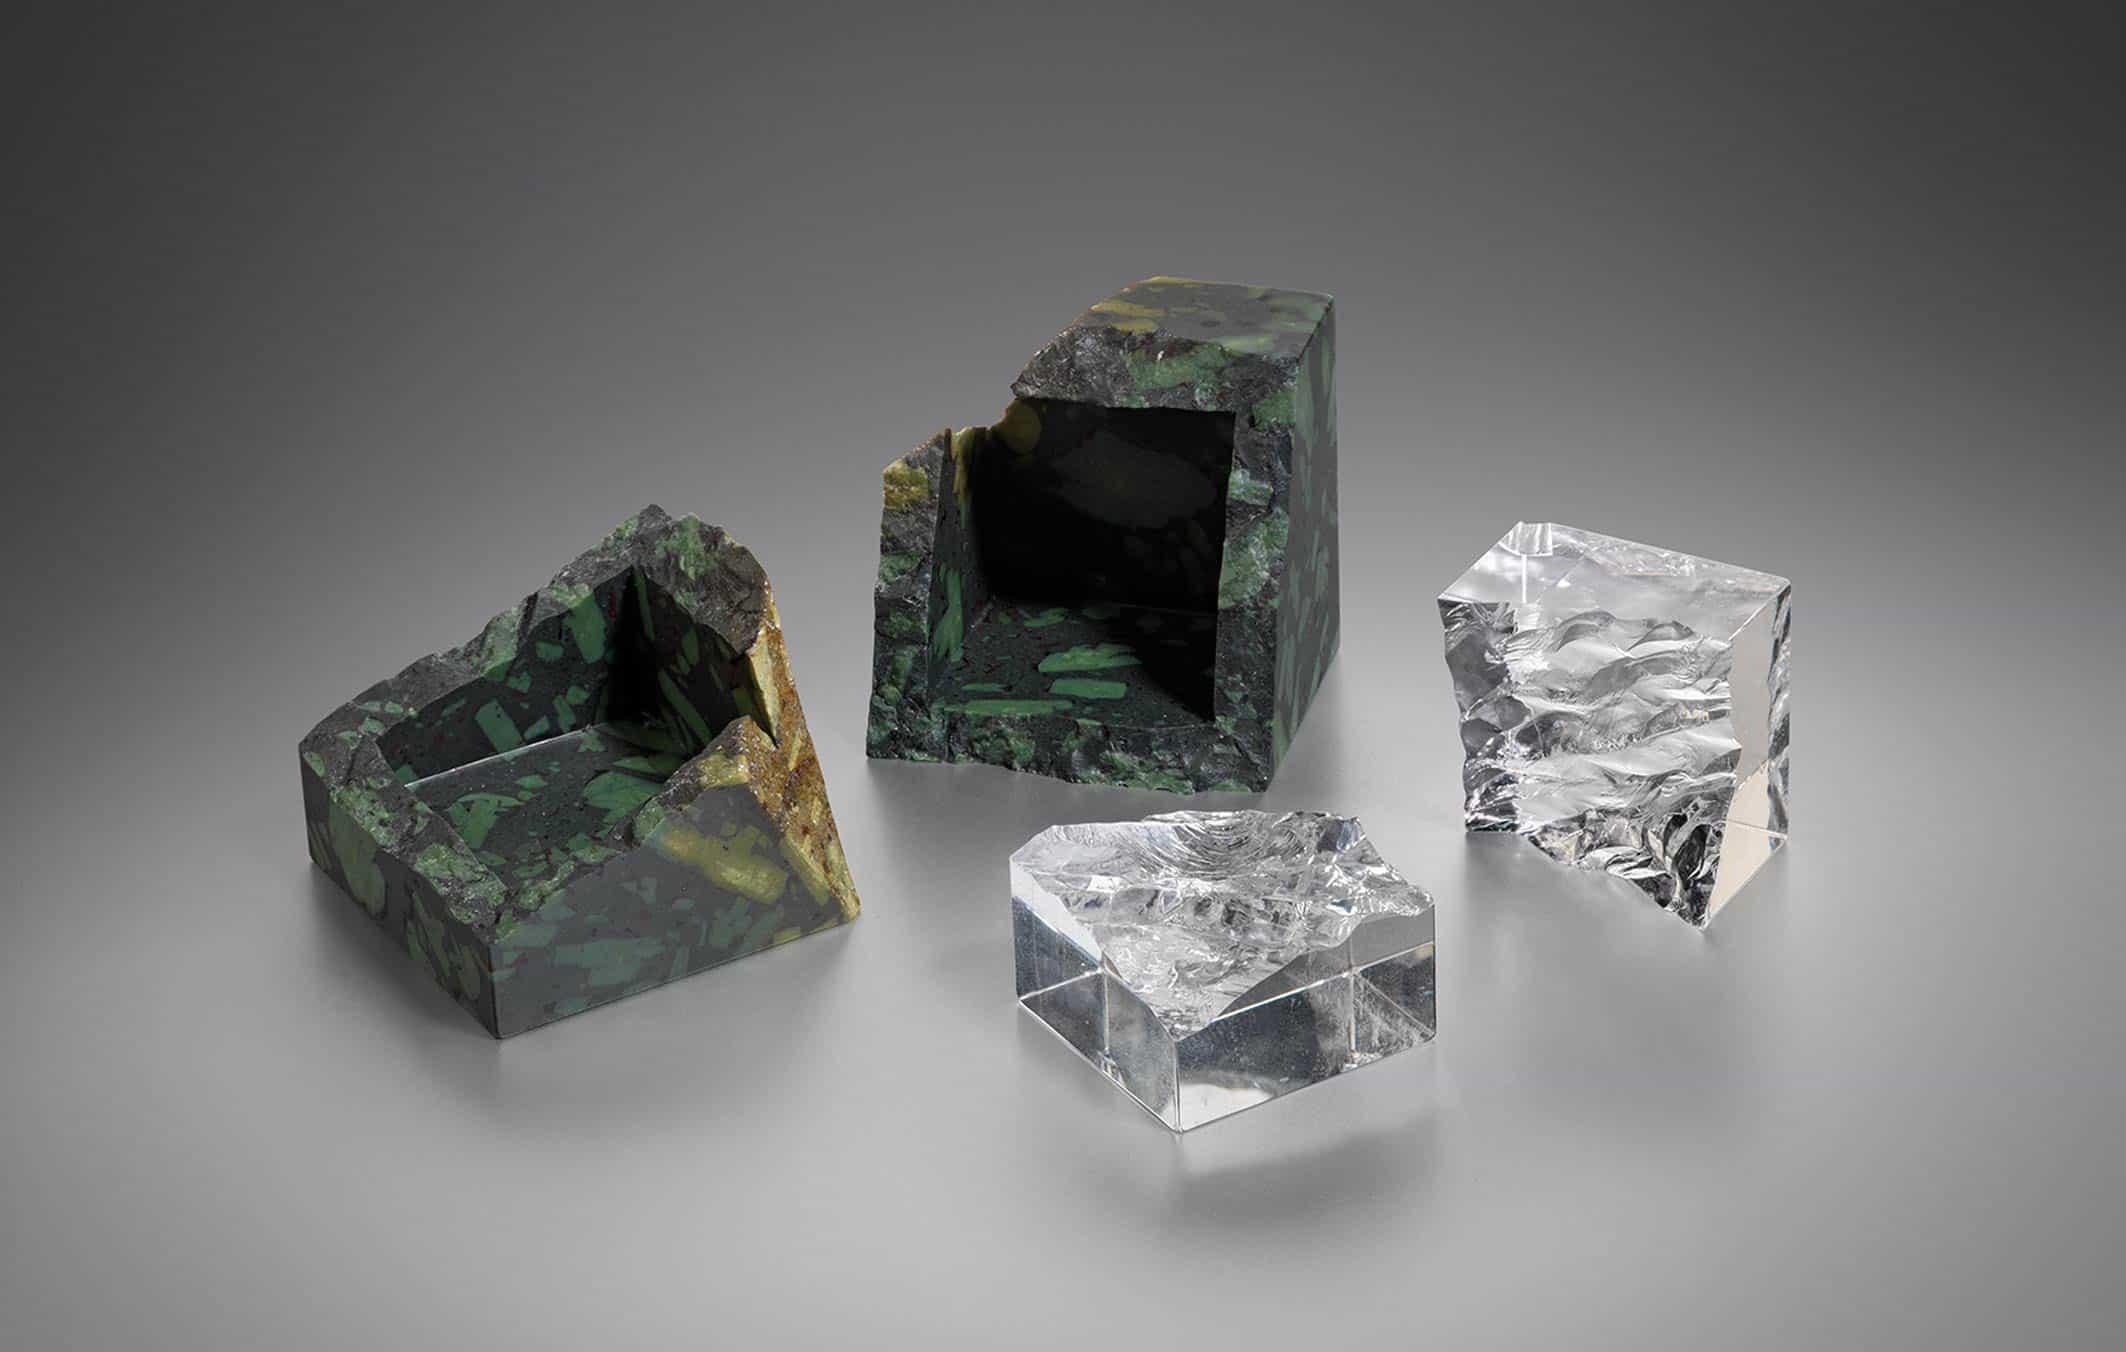 Ben Gaskell Break box porhyryr box containing a split rock-crystal cube